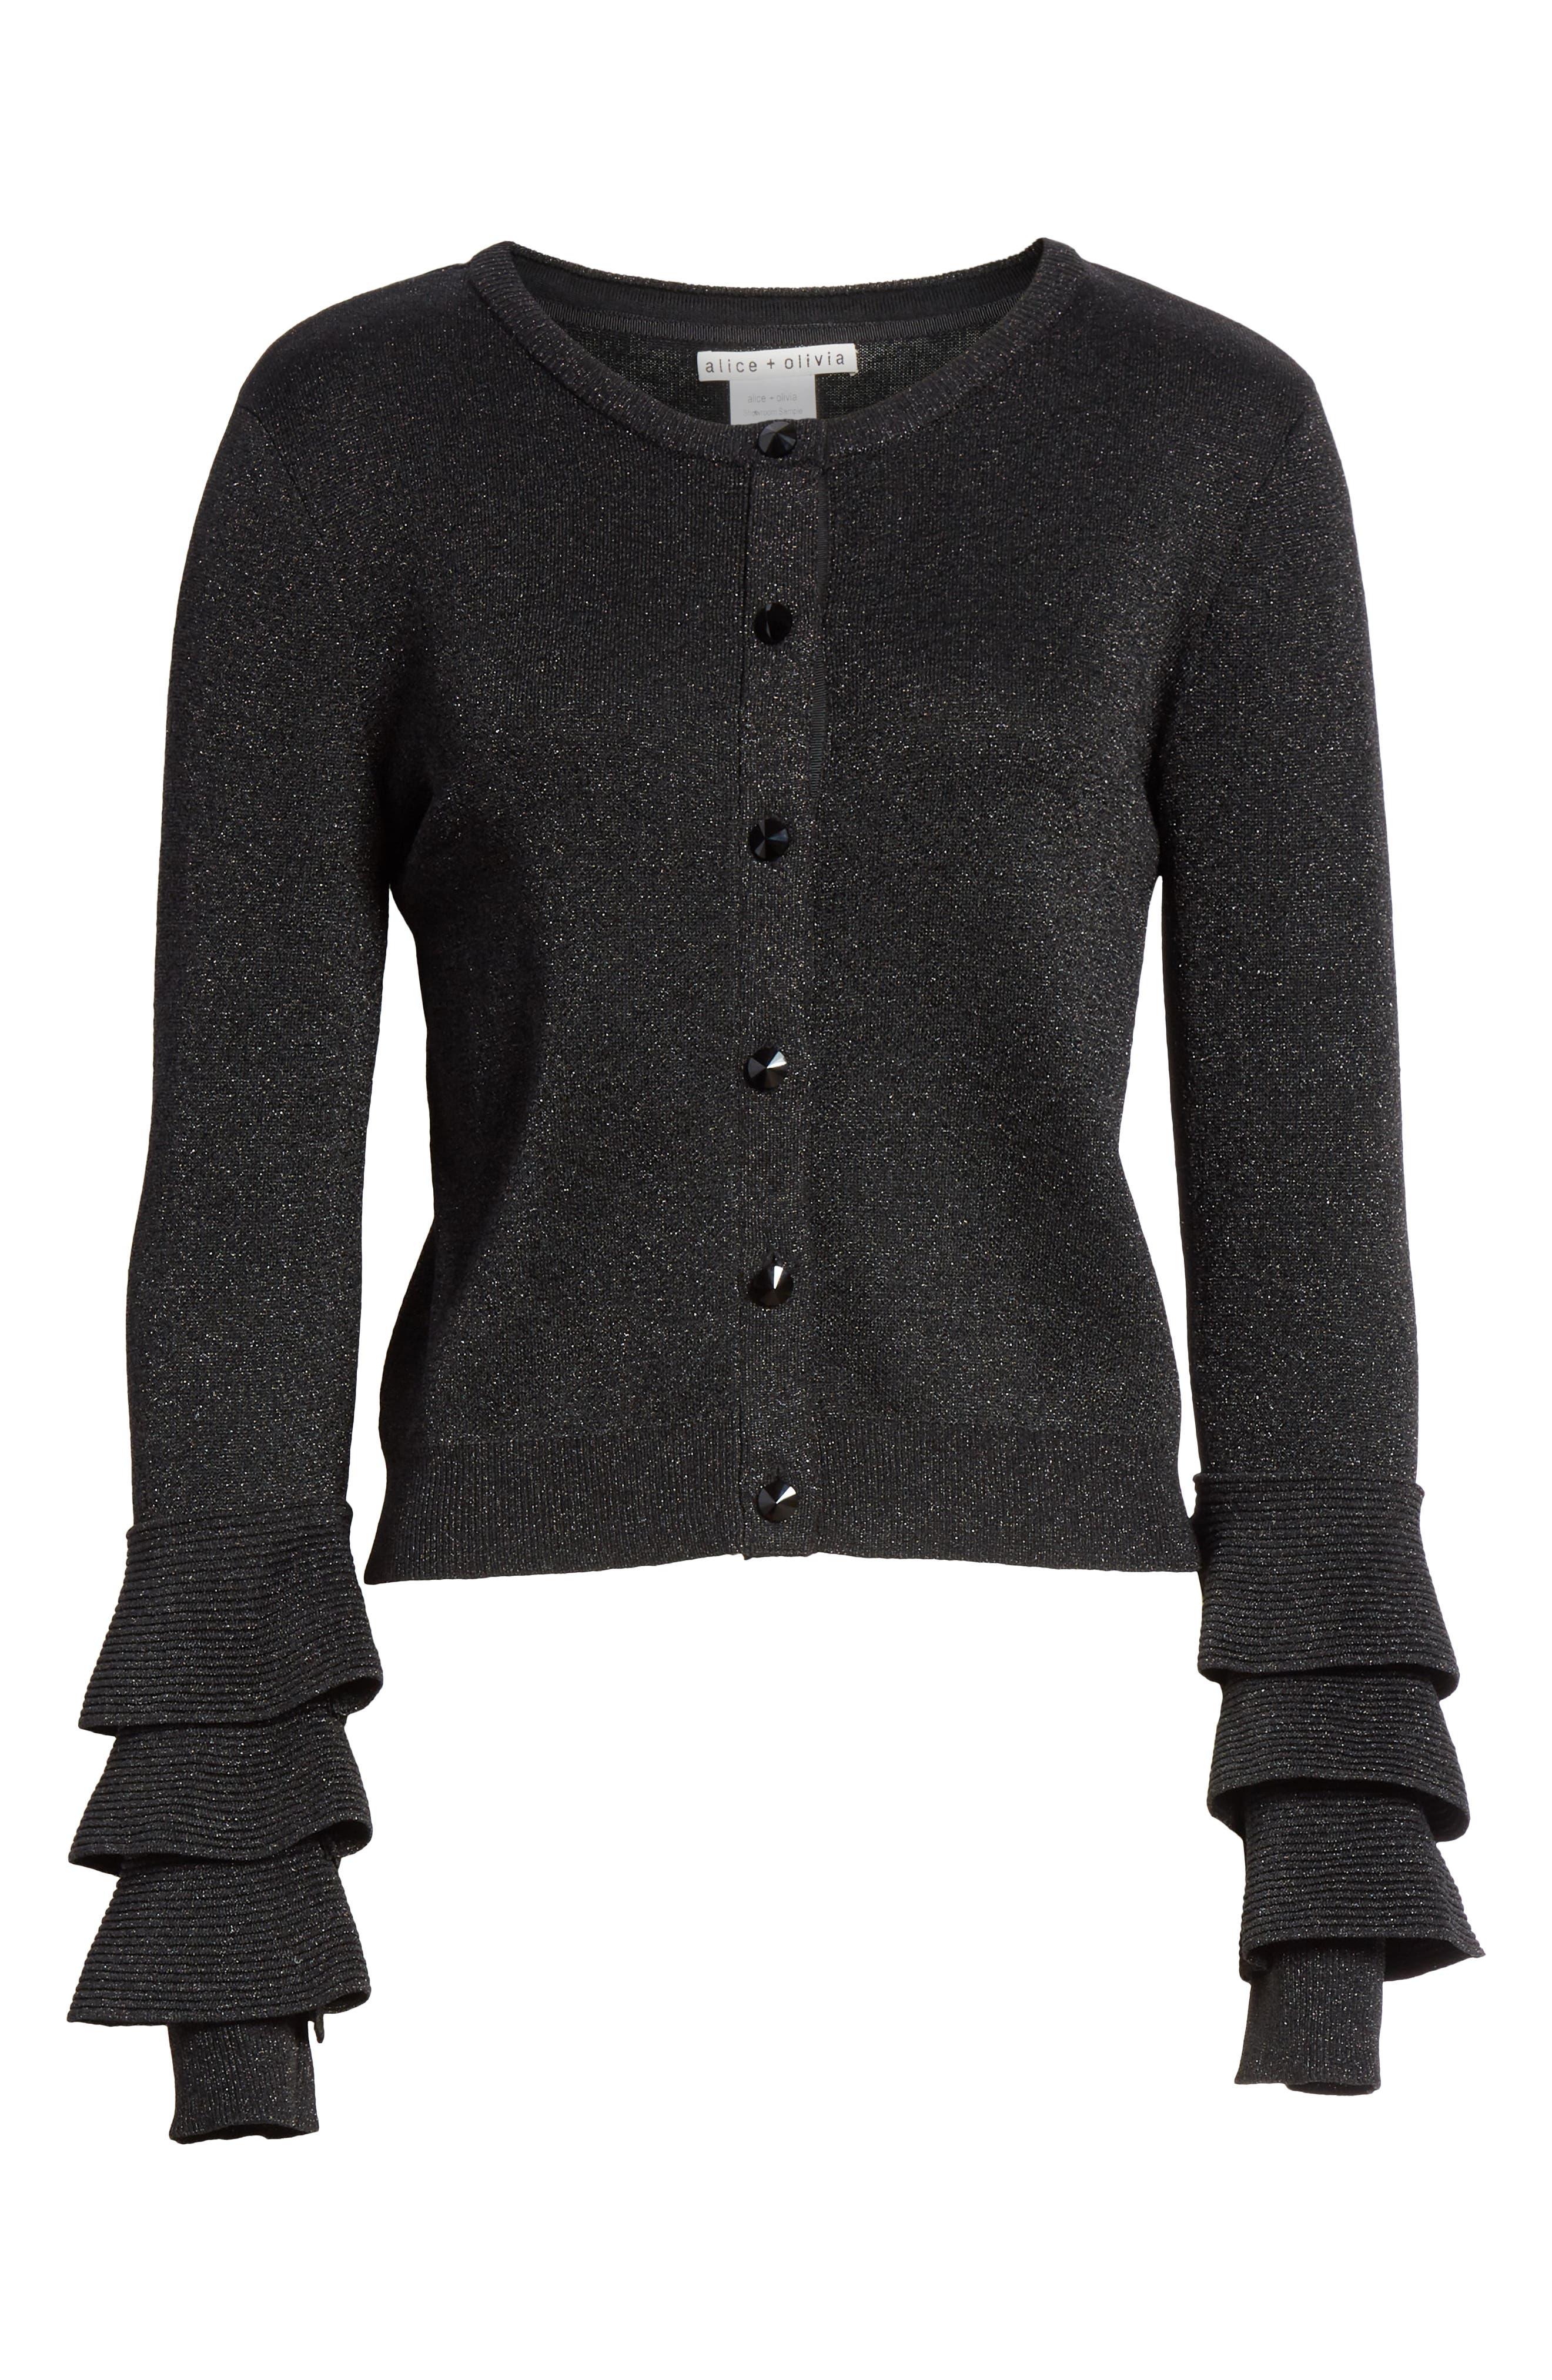 Ruthy Ruffle Cuff Sparkle Wool Blend Cardigan,                             Alternate thumbnail 6, color,                             BLACK METALLIC